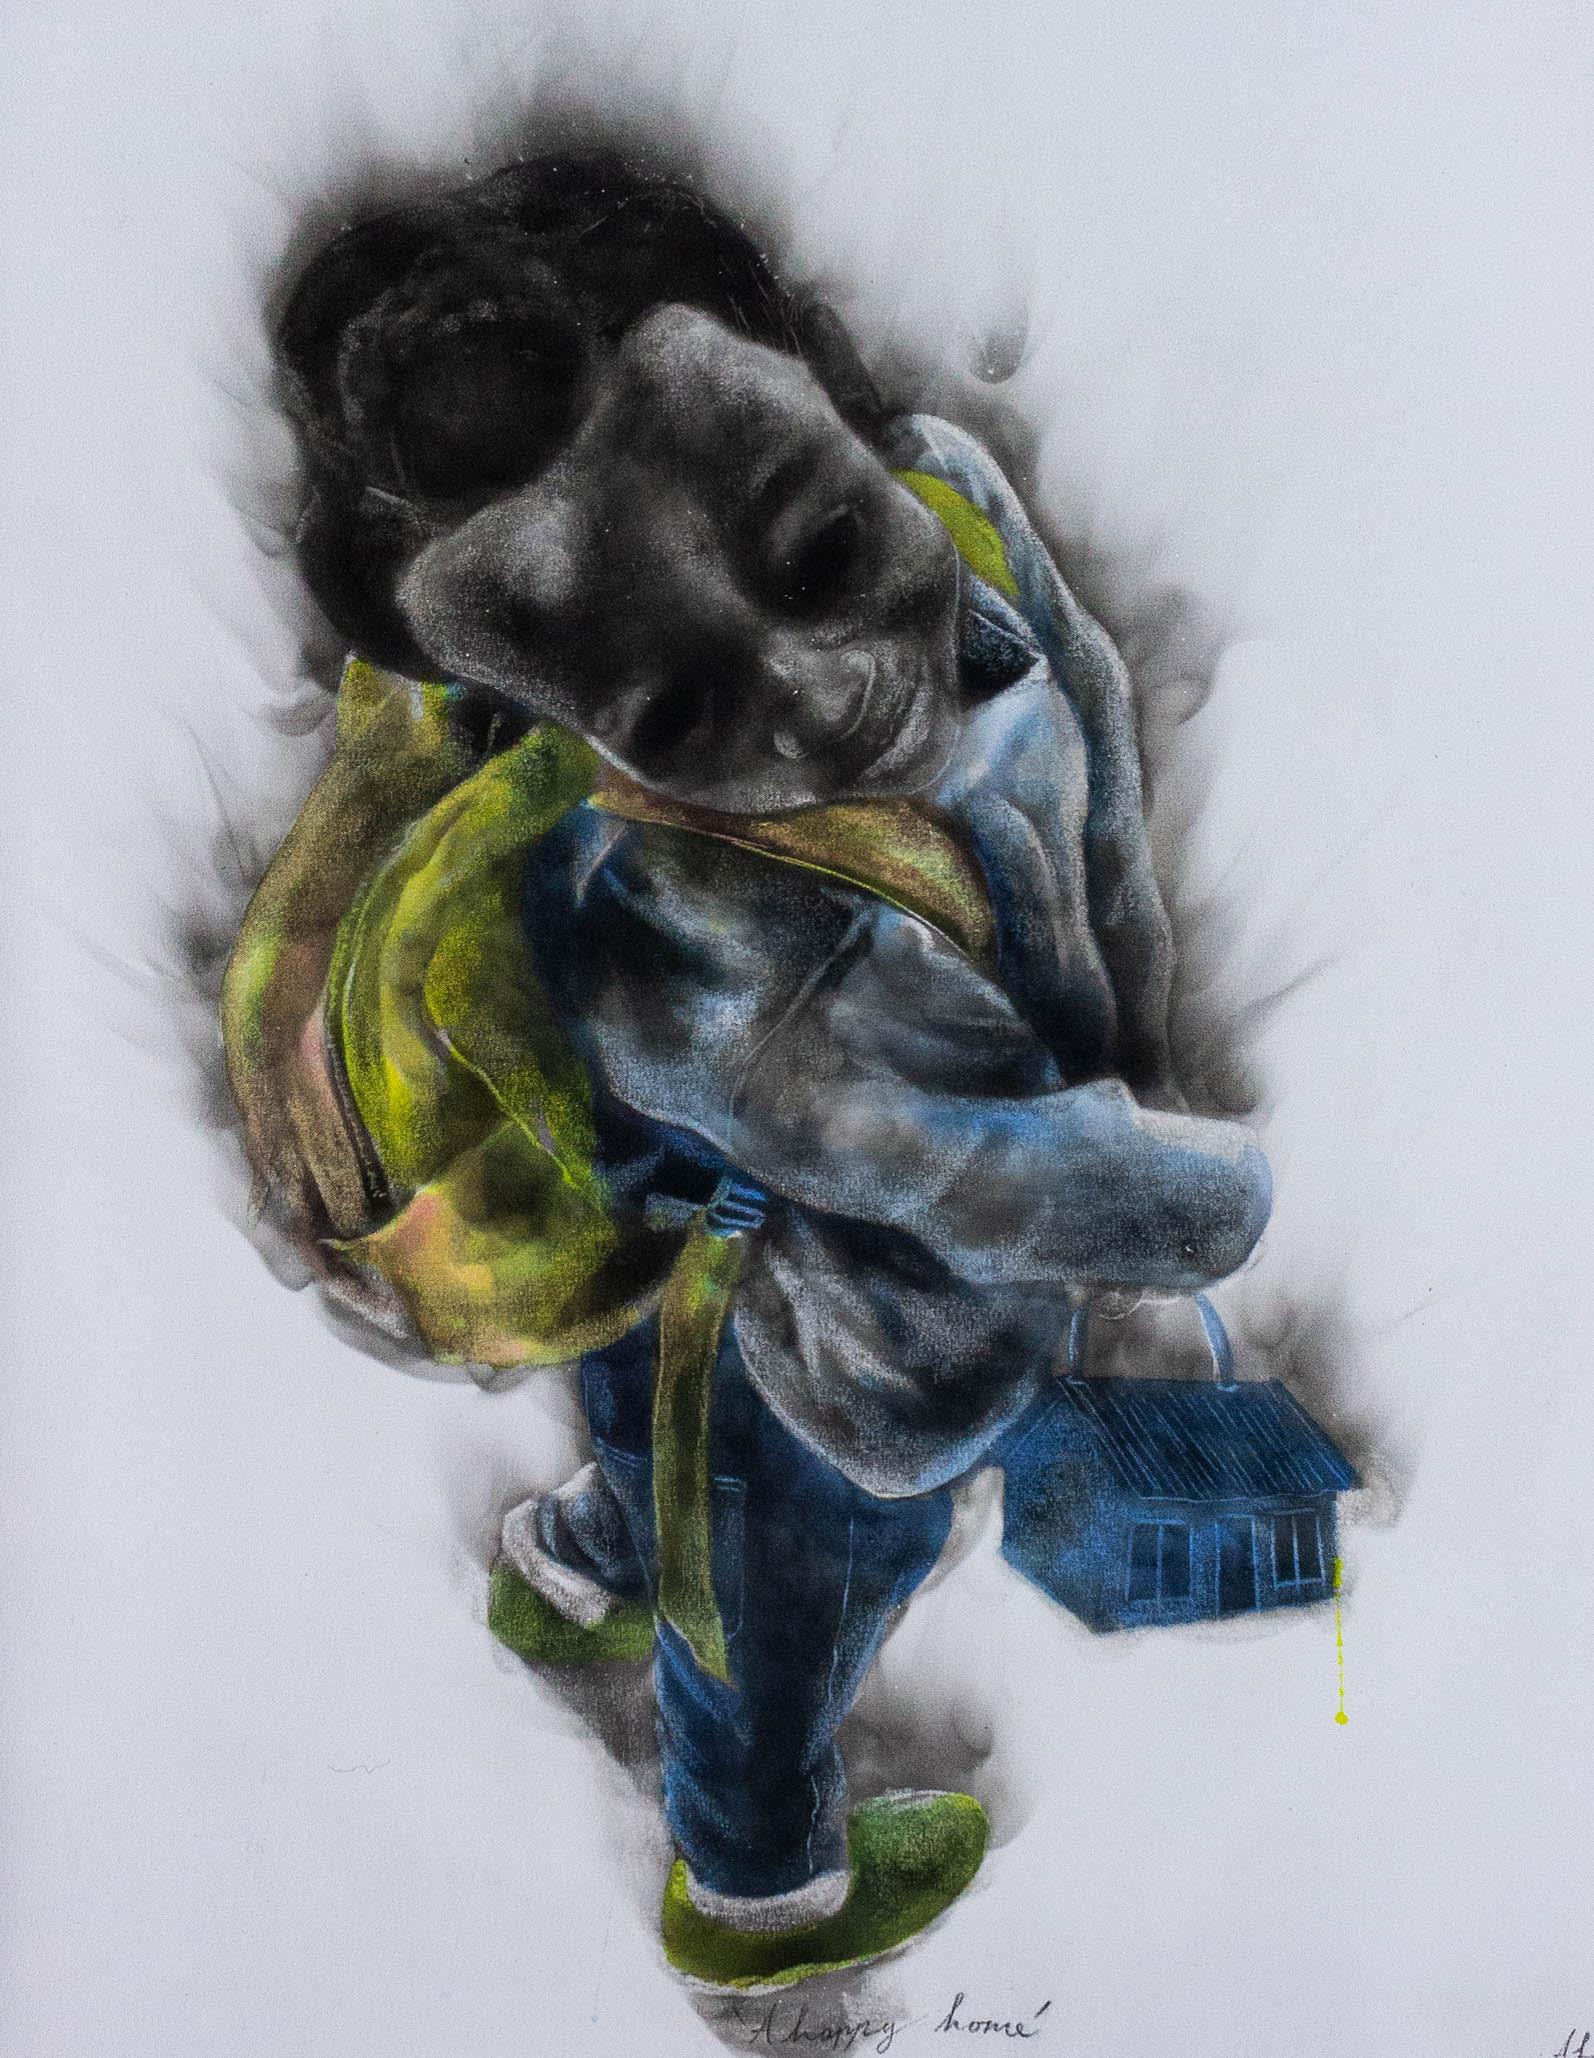 <span class=&#34;link fancybox-details-link&#34;><a href=&#34;/artists/54-azael-langa/works/3303-azael-langa-a-happy-home-2019/&#34;>View Detail Page</a></span><div class=&#34;artist&#34;><strong>Azael Langa</strong></div> <div class=&#34;title&#34;><em>A Happy Home</em>, 2019</div> <div class=&#34;medium&#34;>Smoke And Ink On Canvas</div> <div class=&#34;dimensions&#34;>98cm x 80cm (114.5cm x 94.5cm framed)</div>